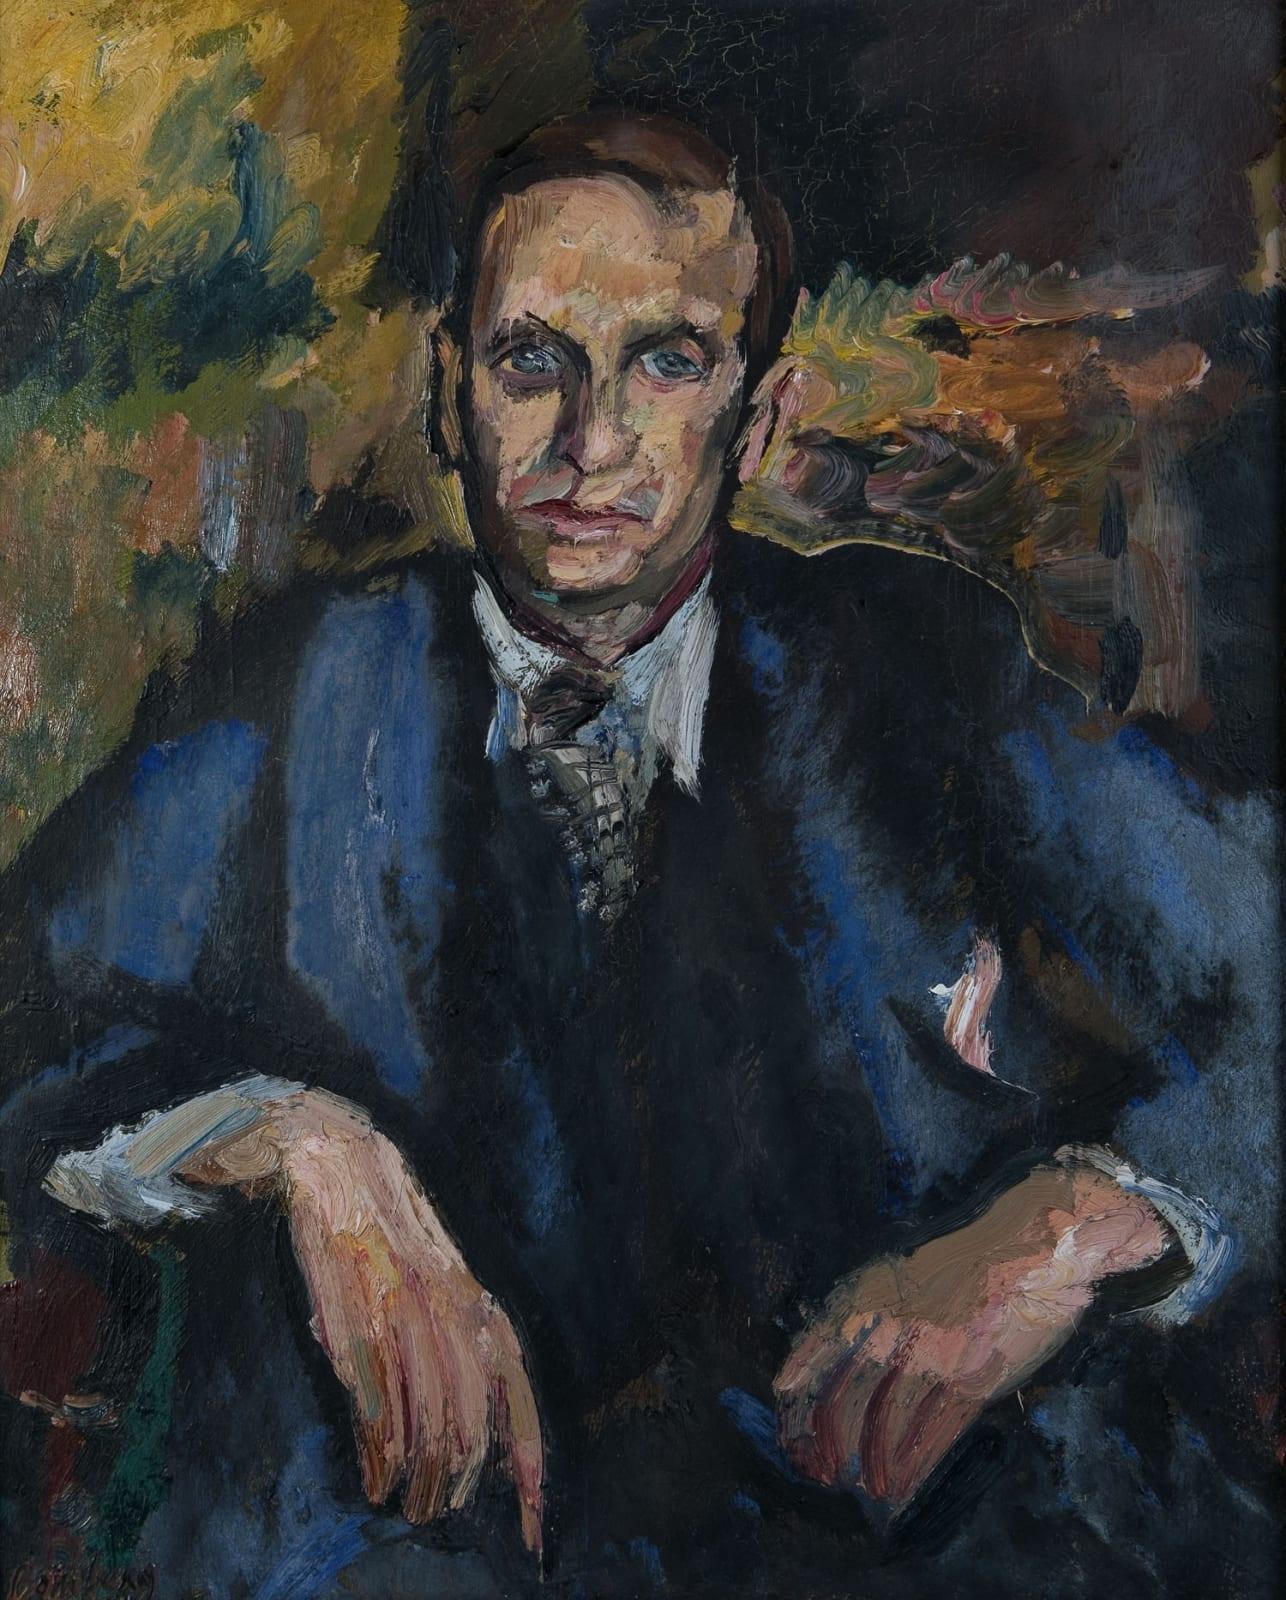 David Bomberg Portrait of John Rodker, c.1931 Oil on canvas 71.5 x 57cm. Ben Uri Collection Presented by Joan Rodker 2008